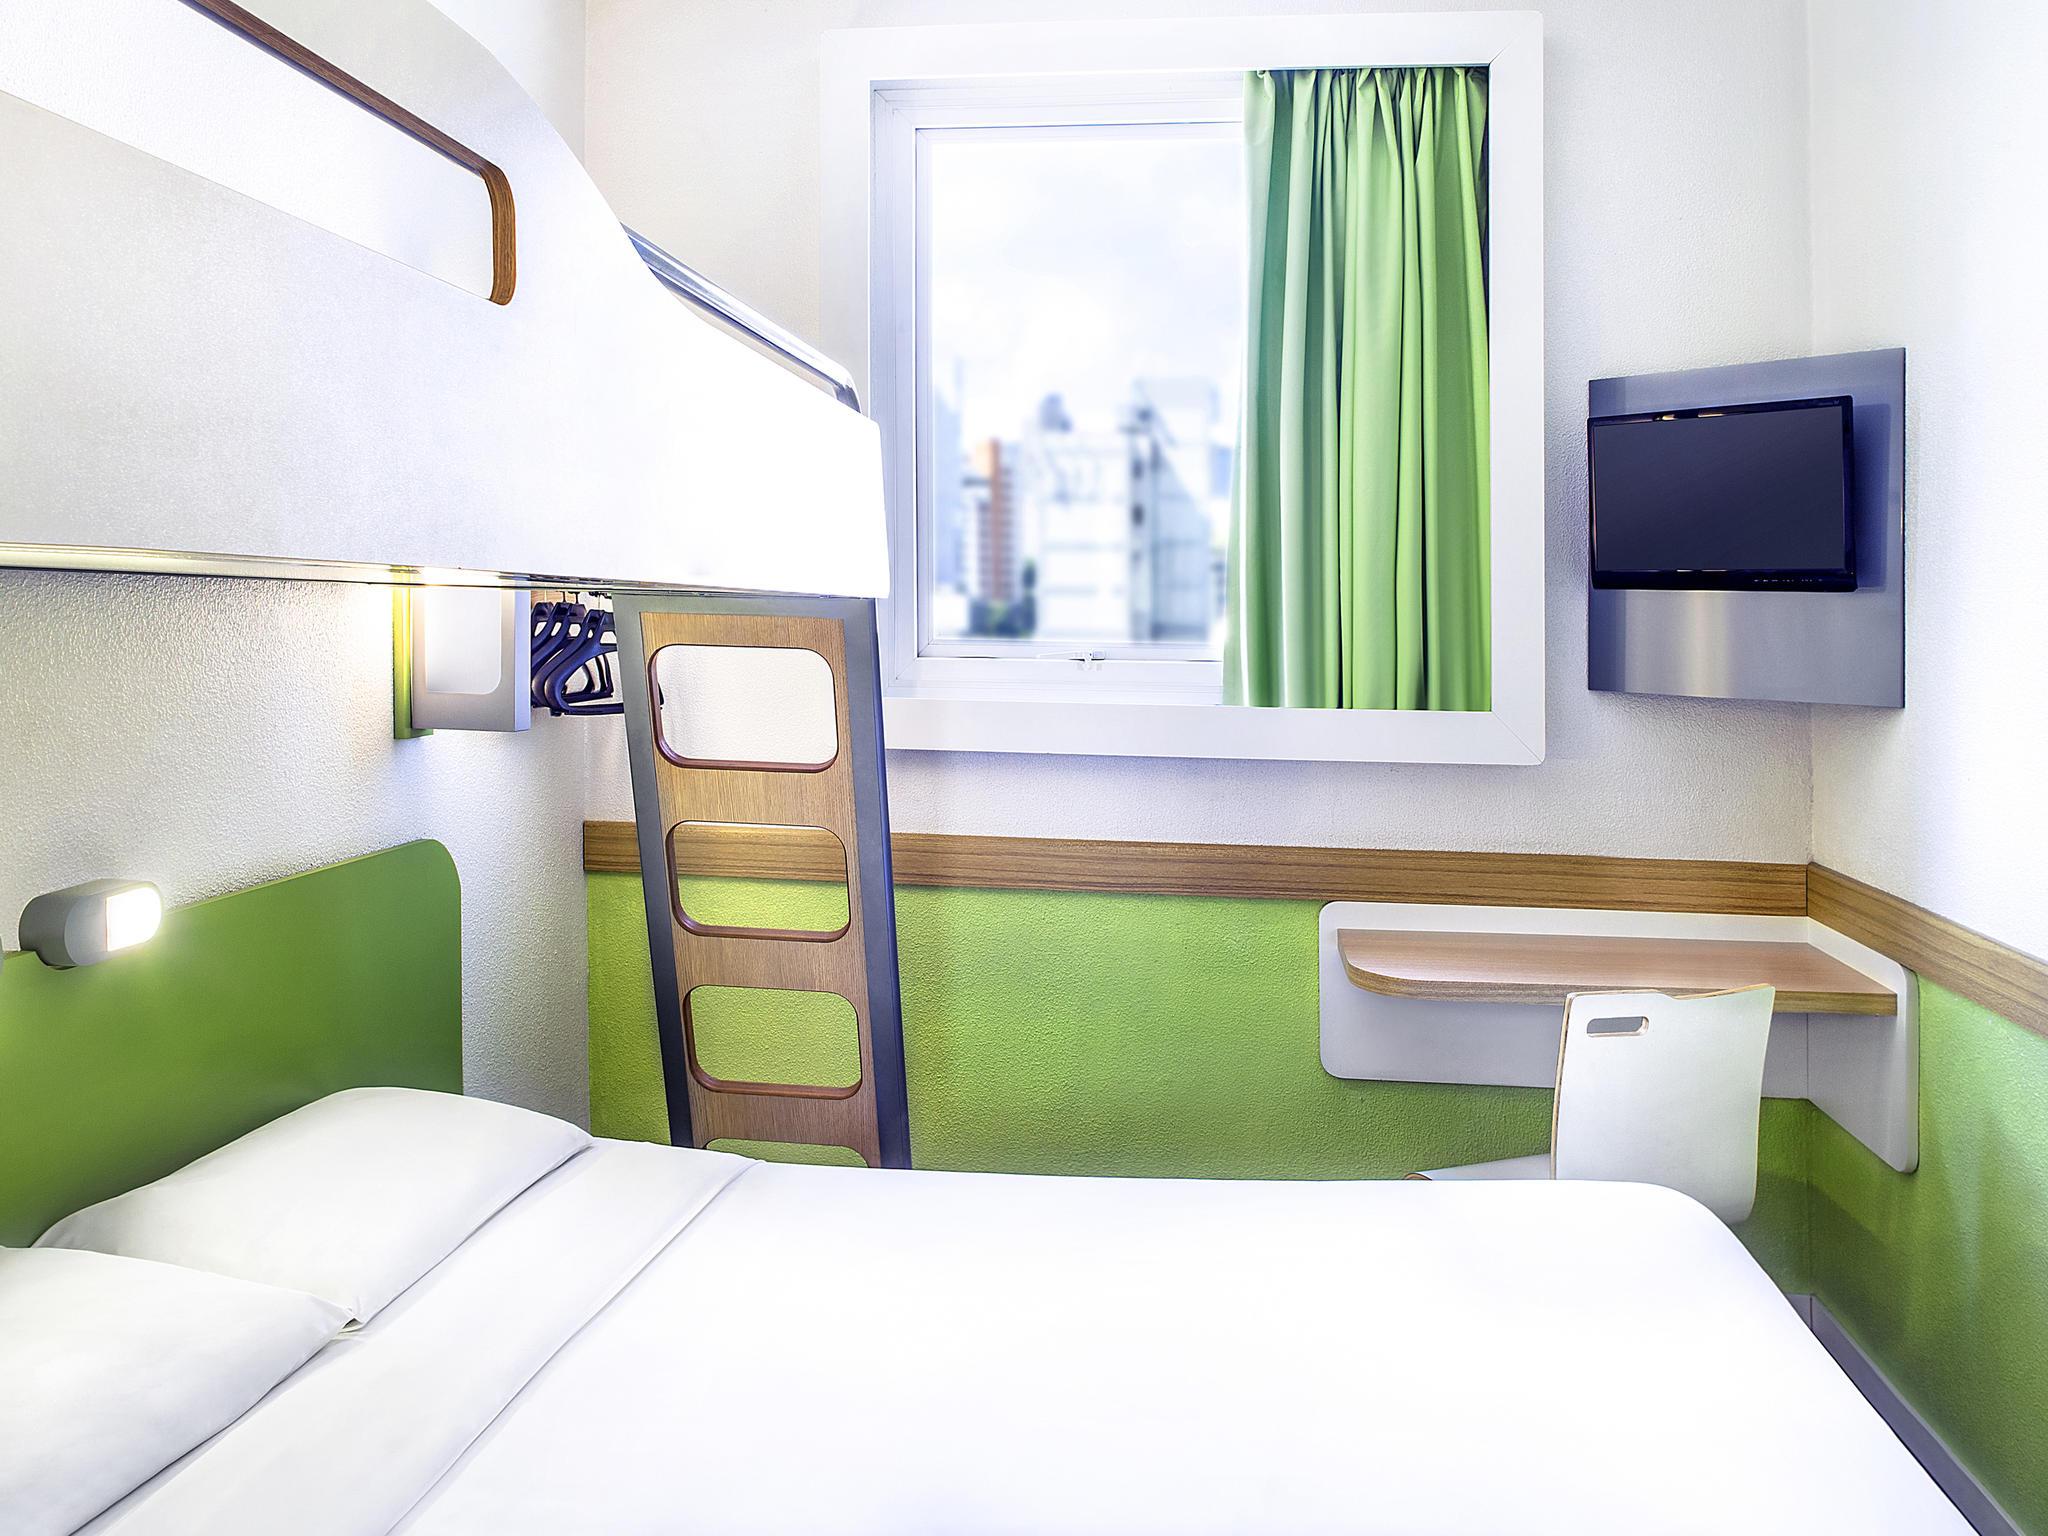 Hotel en BELO HORIZONTE ibis budget Belo Horizonte Minascentro #7B6850 2048x1536 Balança De Banheiro Belo Horizonte